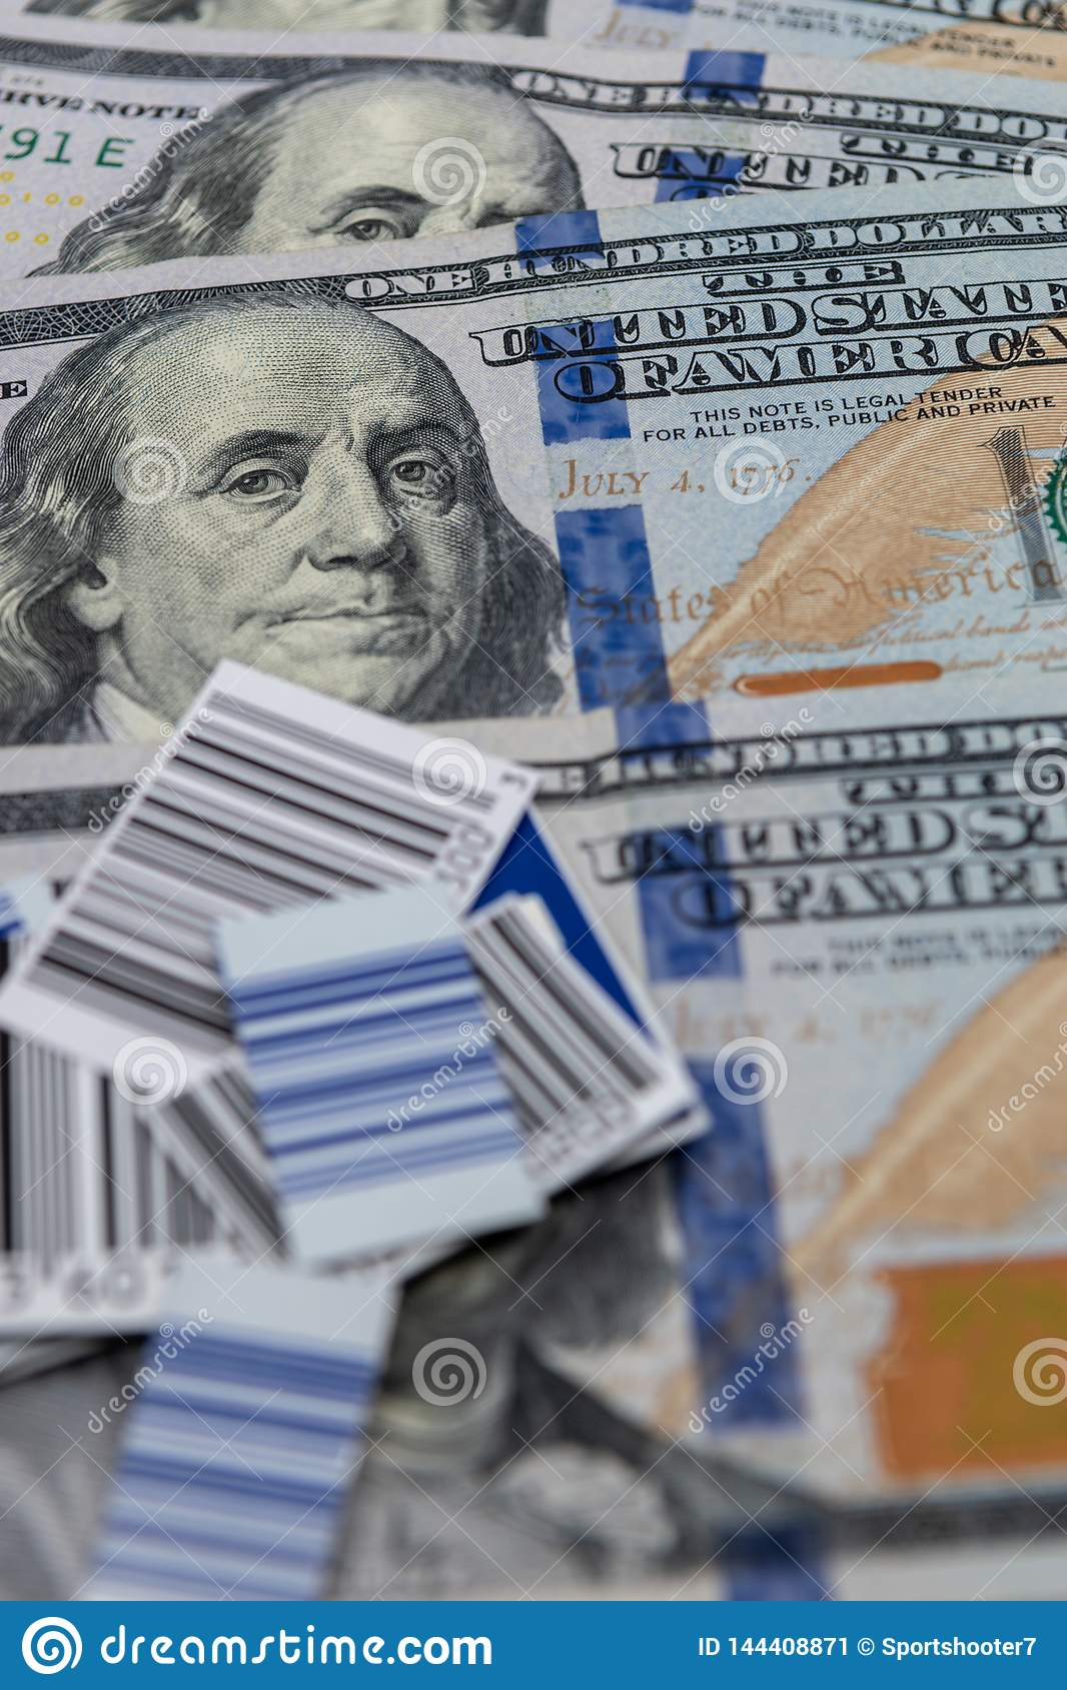 UPC codes against $100 bills background - image